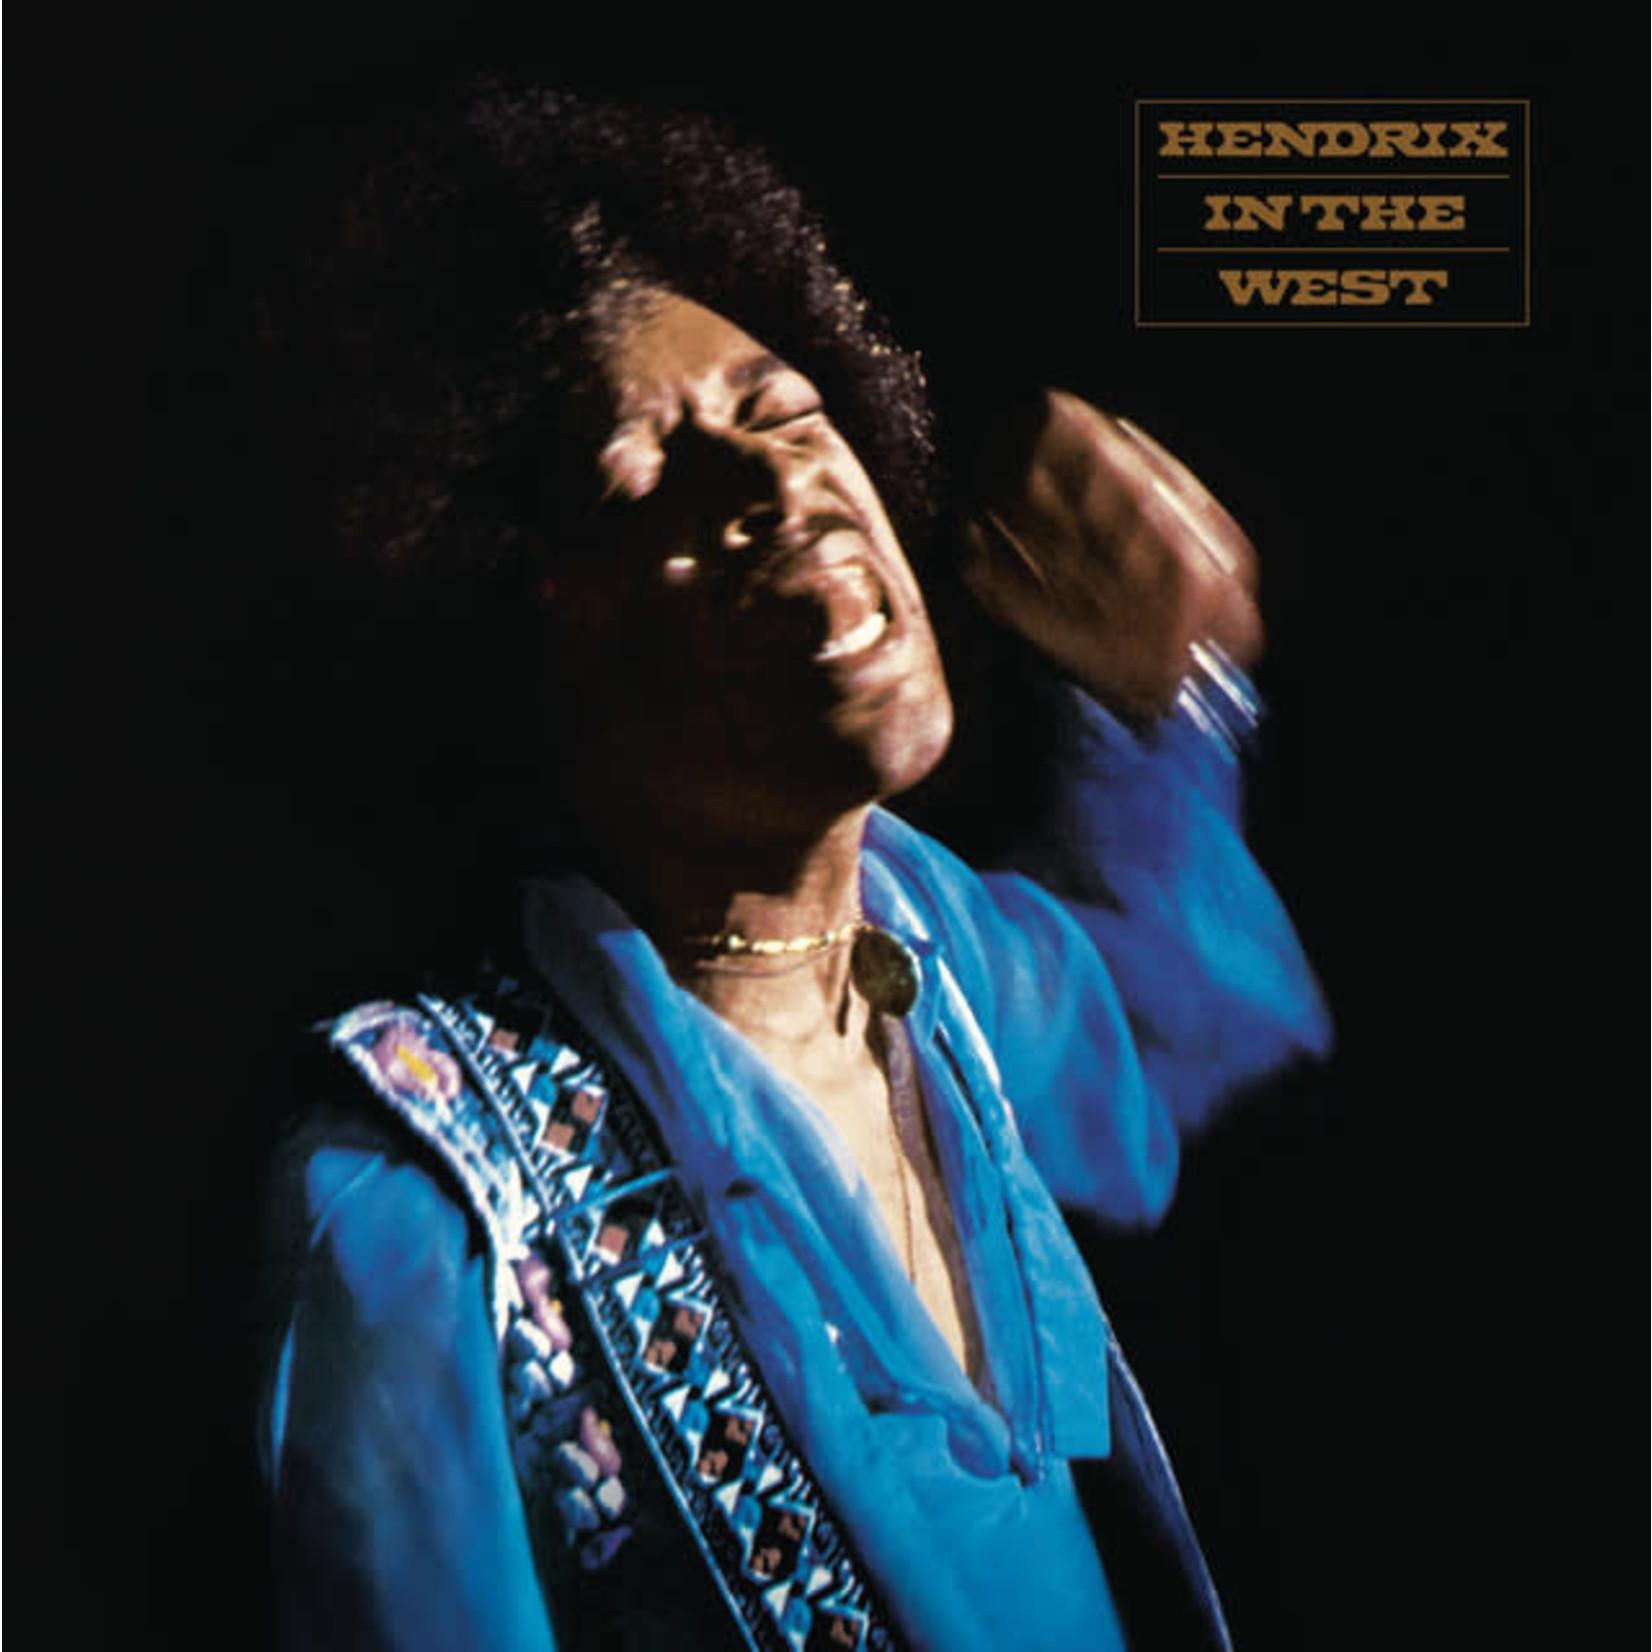 Vinyl Jimi Hendrix - In The West